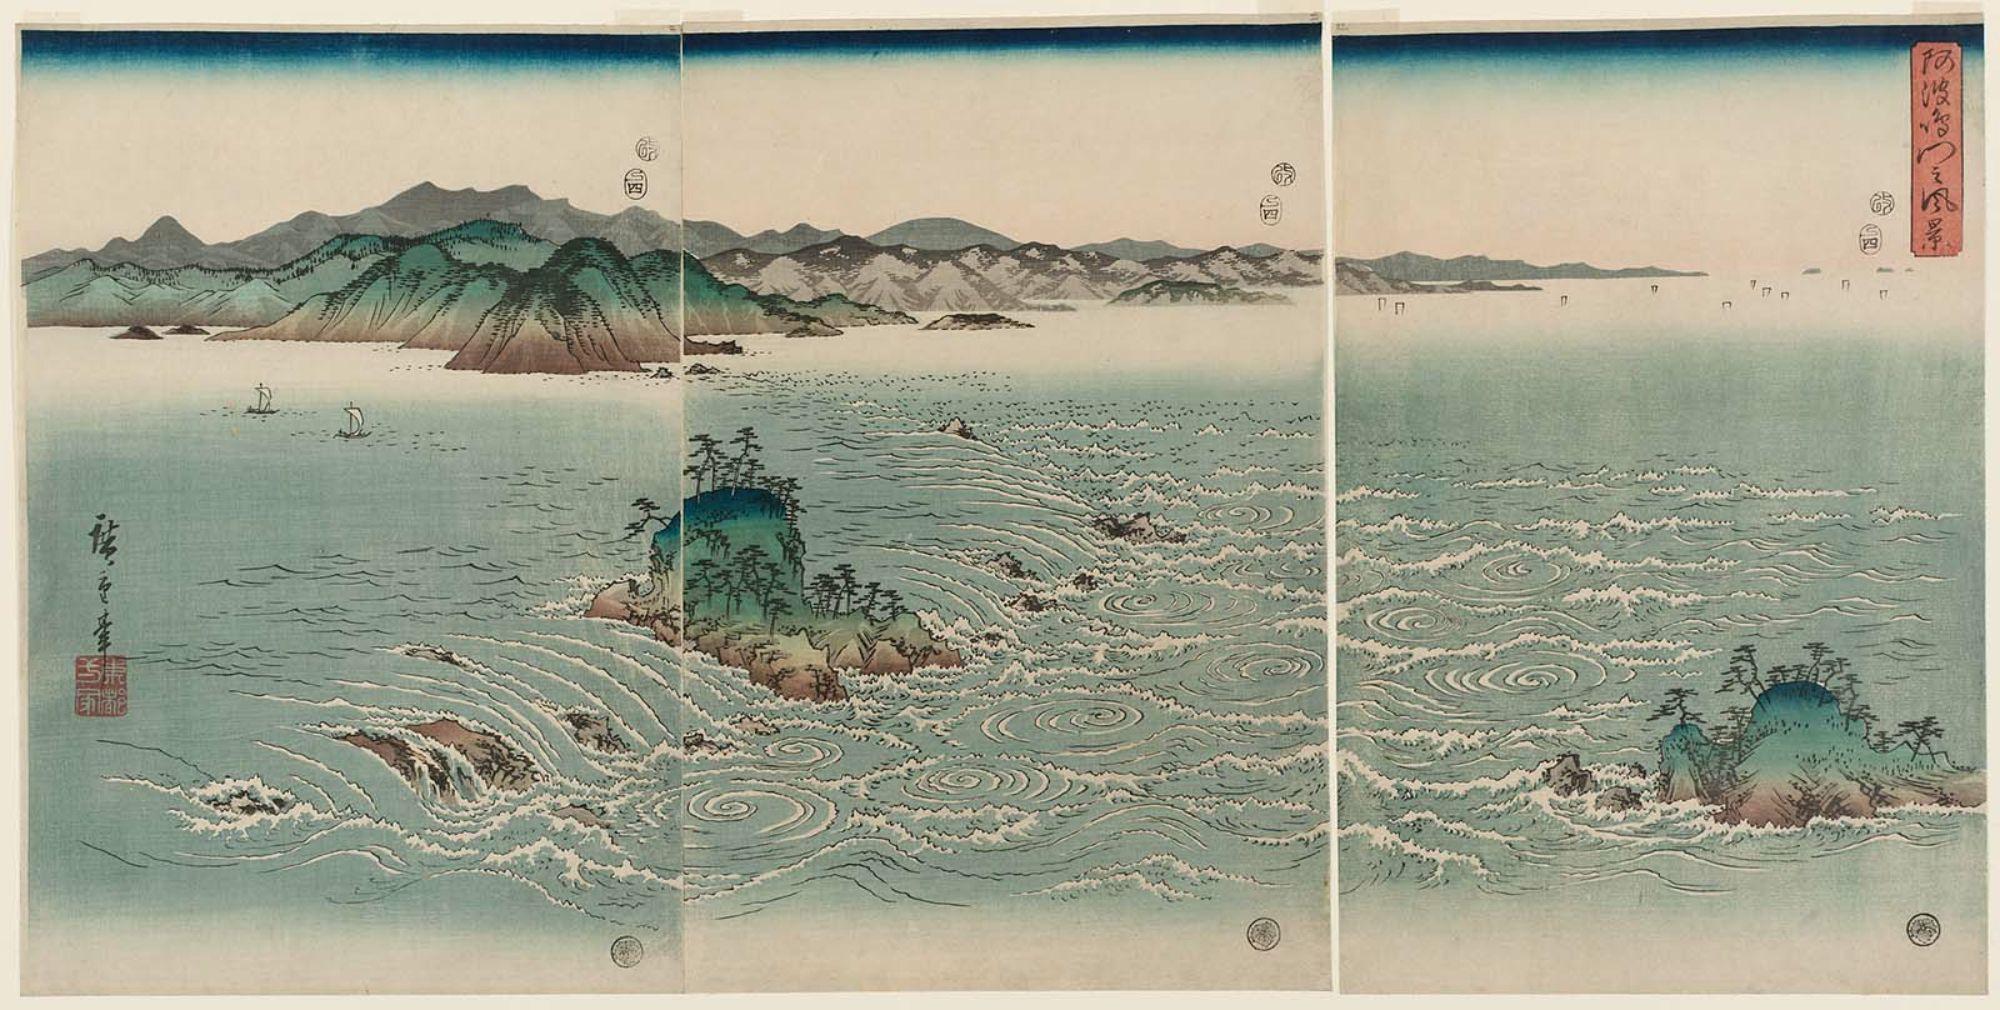 Utagawa Hiroshige: View of the Whirlpools at Awa (Awa Naruto no ...